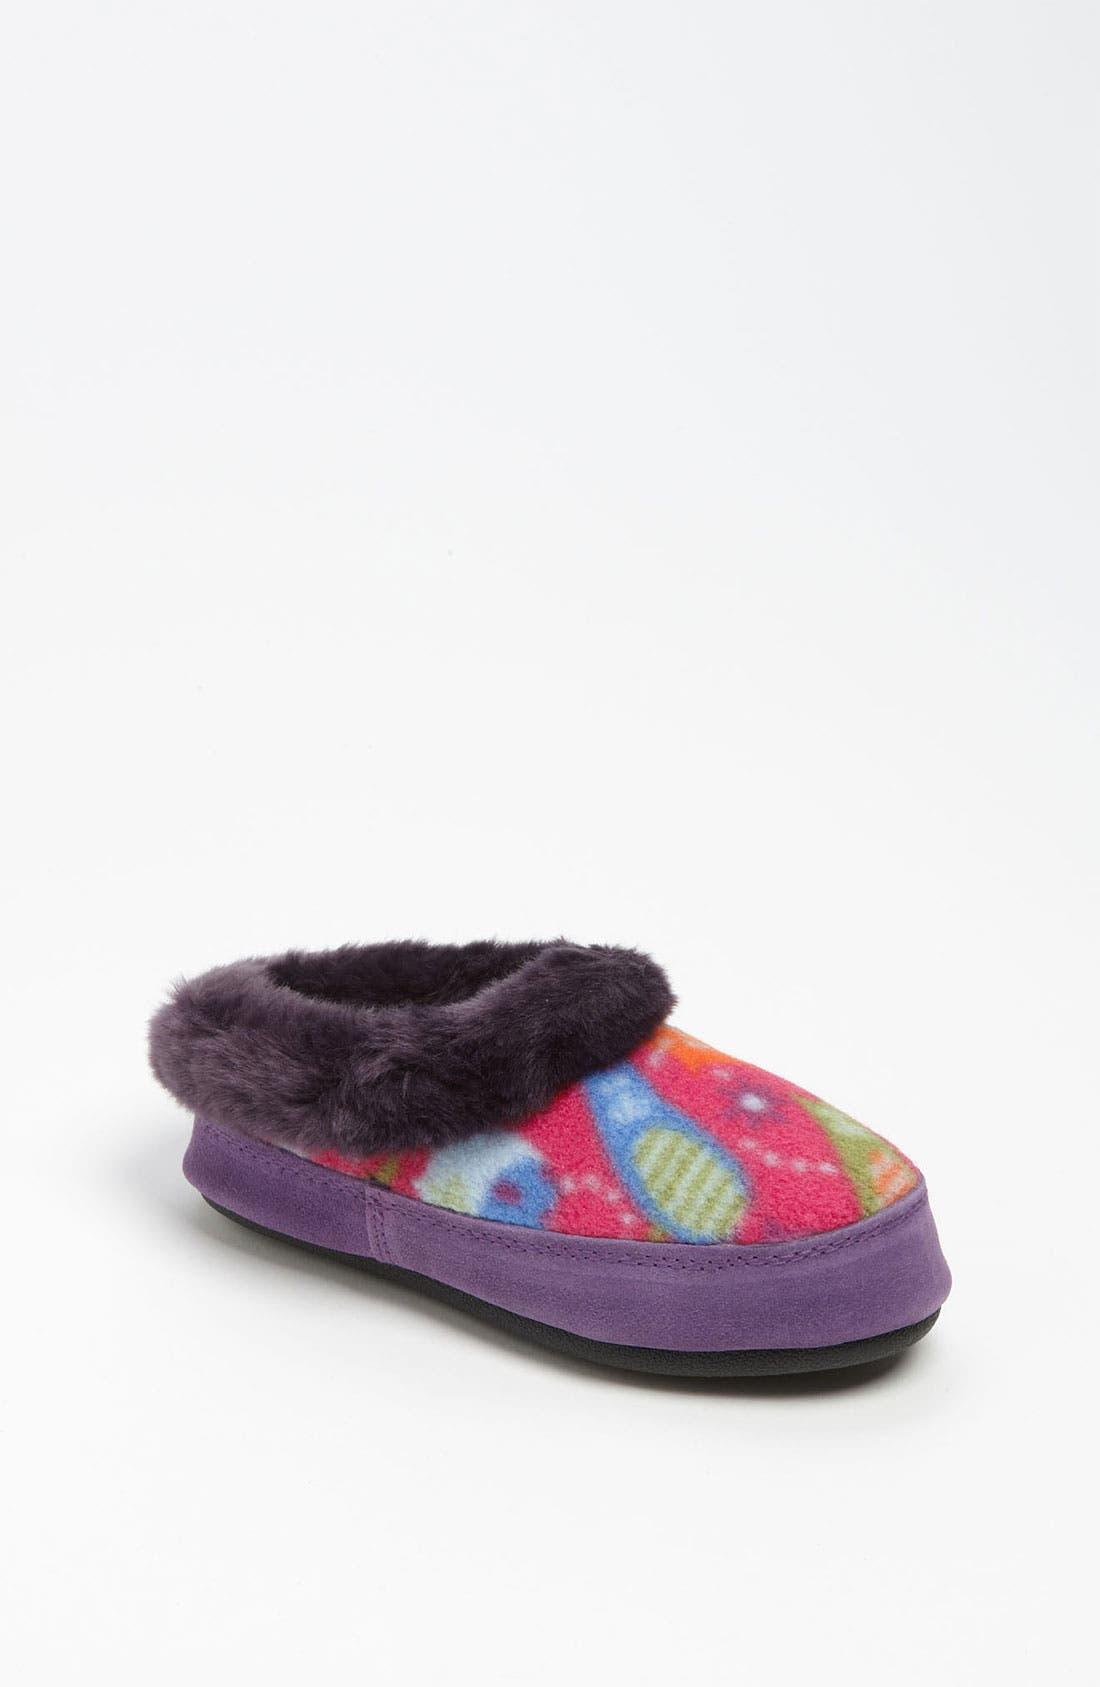 Main Image - Acorn 'Hopscotch' Slipper (Toddler, Little Kid & Big Kid)